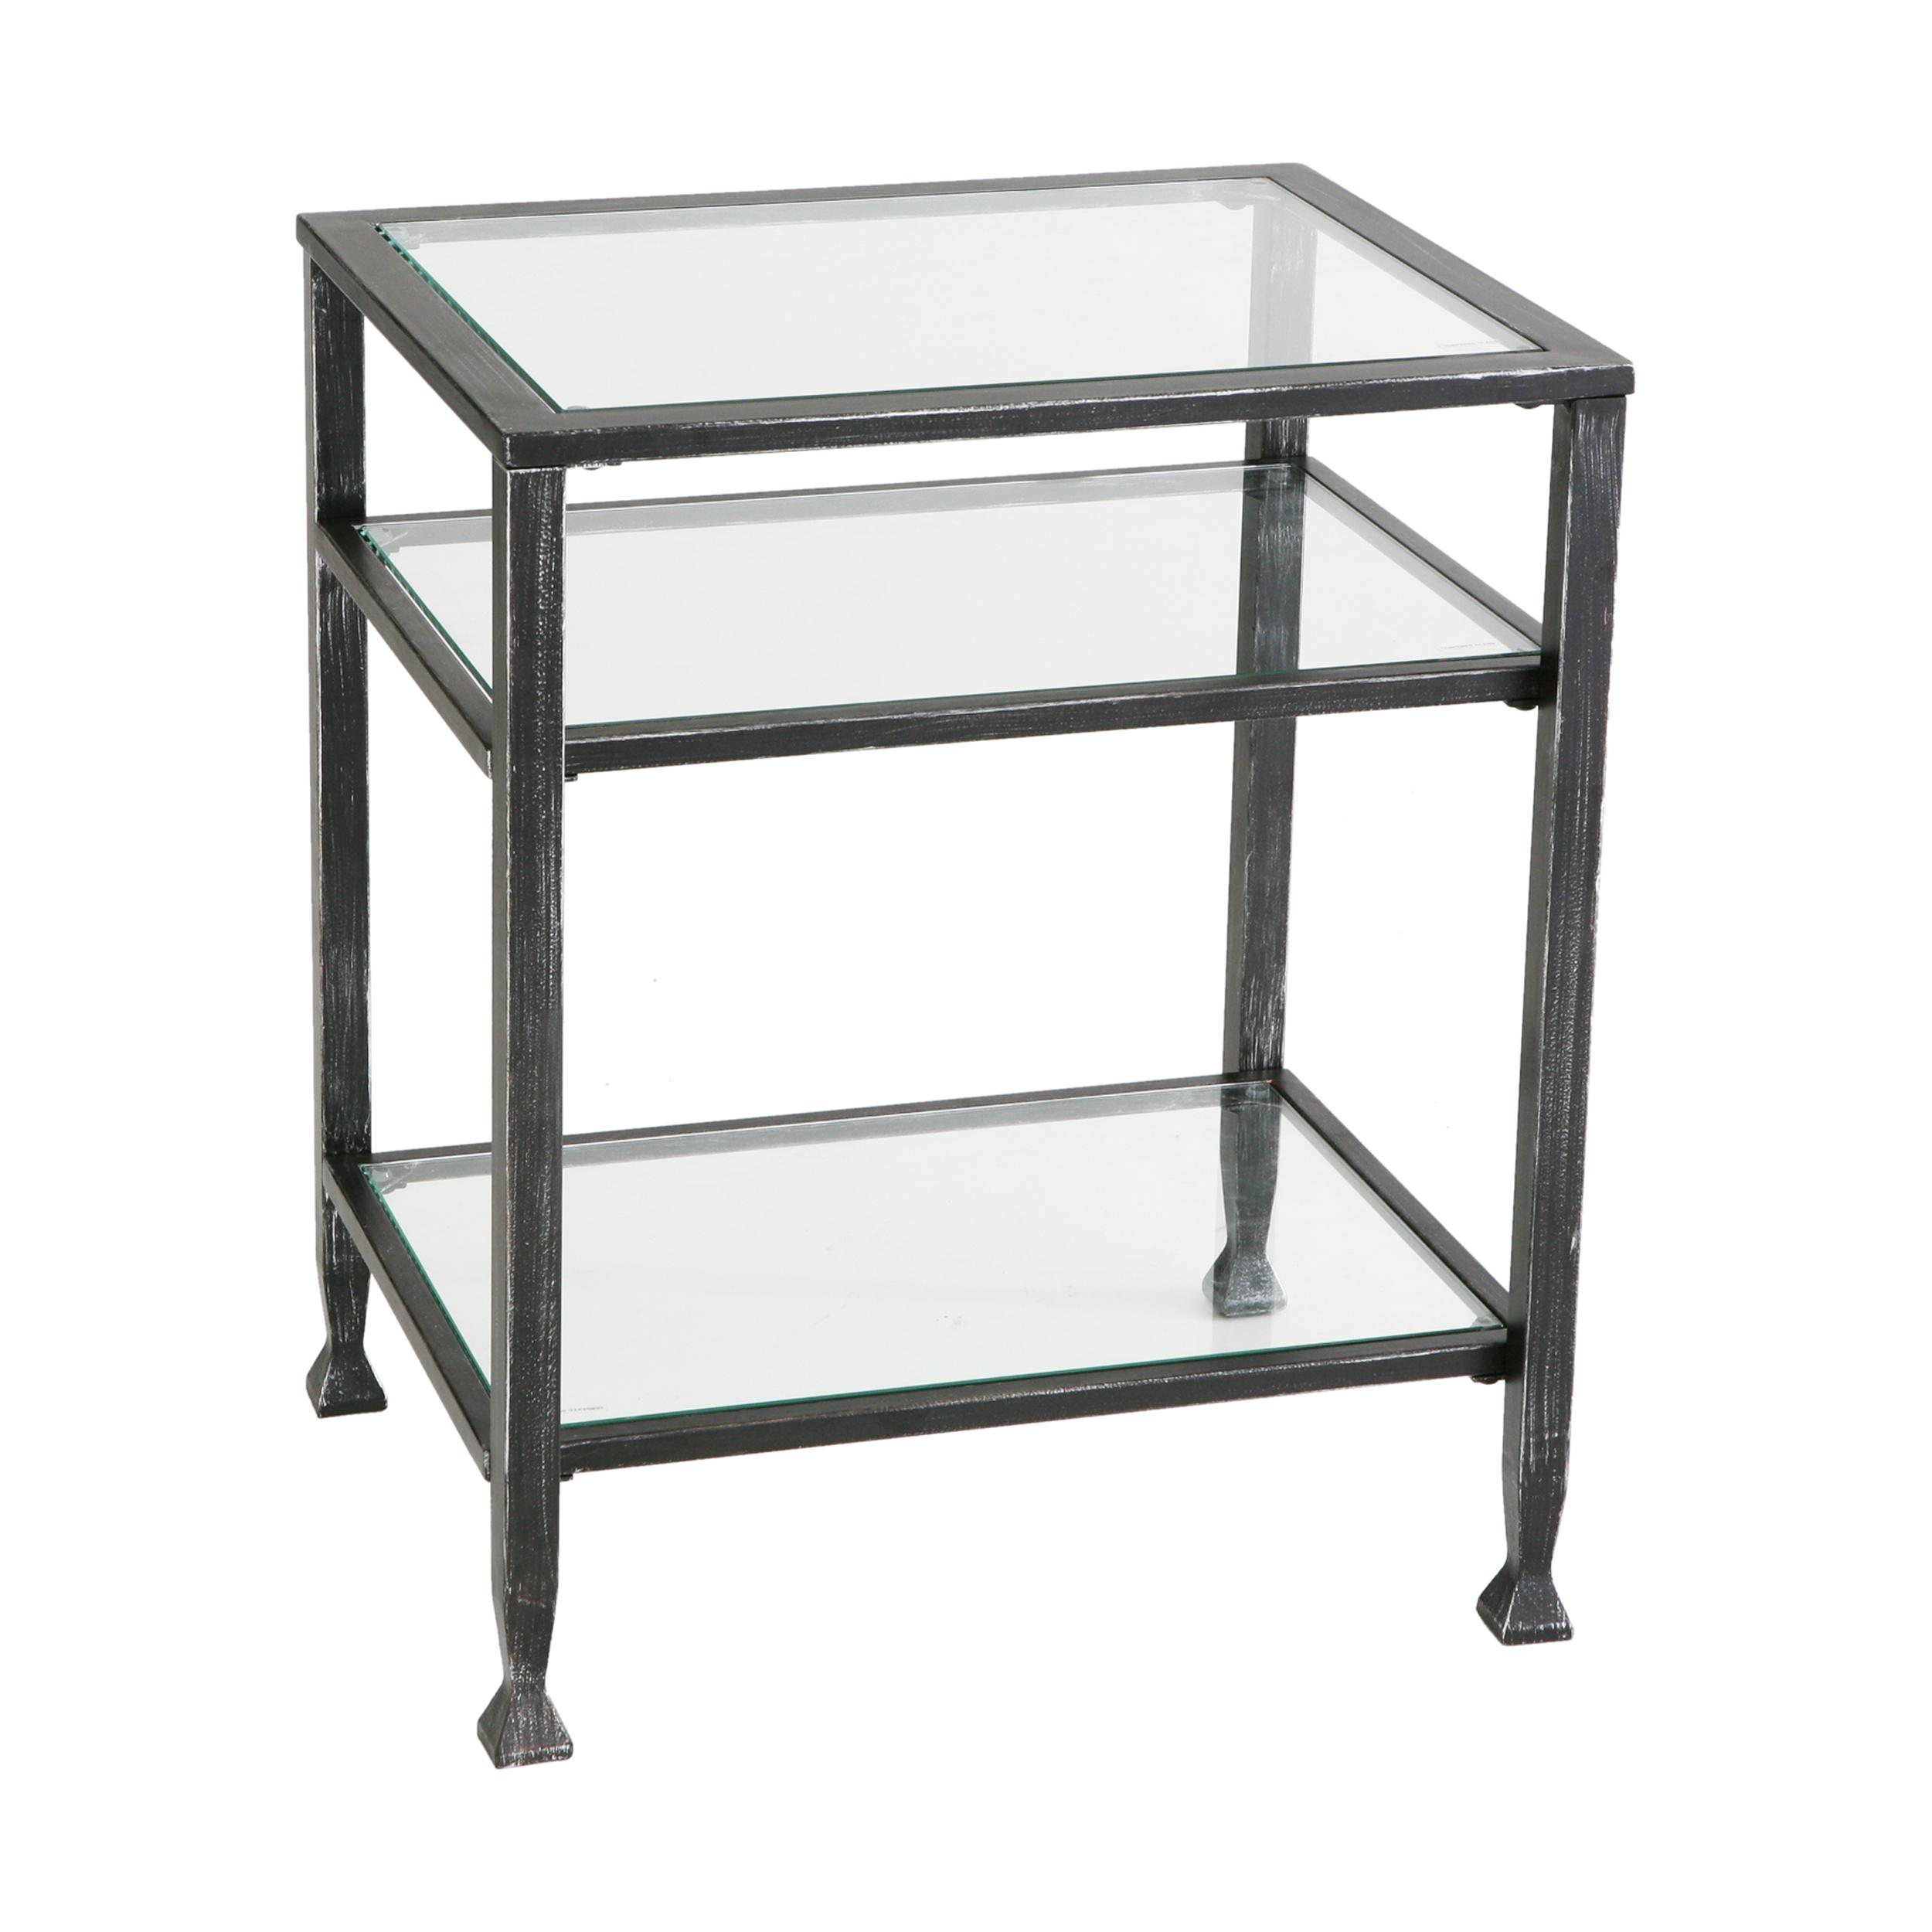 Black Glass Coffee Table Amazon: SEI Bunching Metal End Table